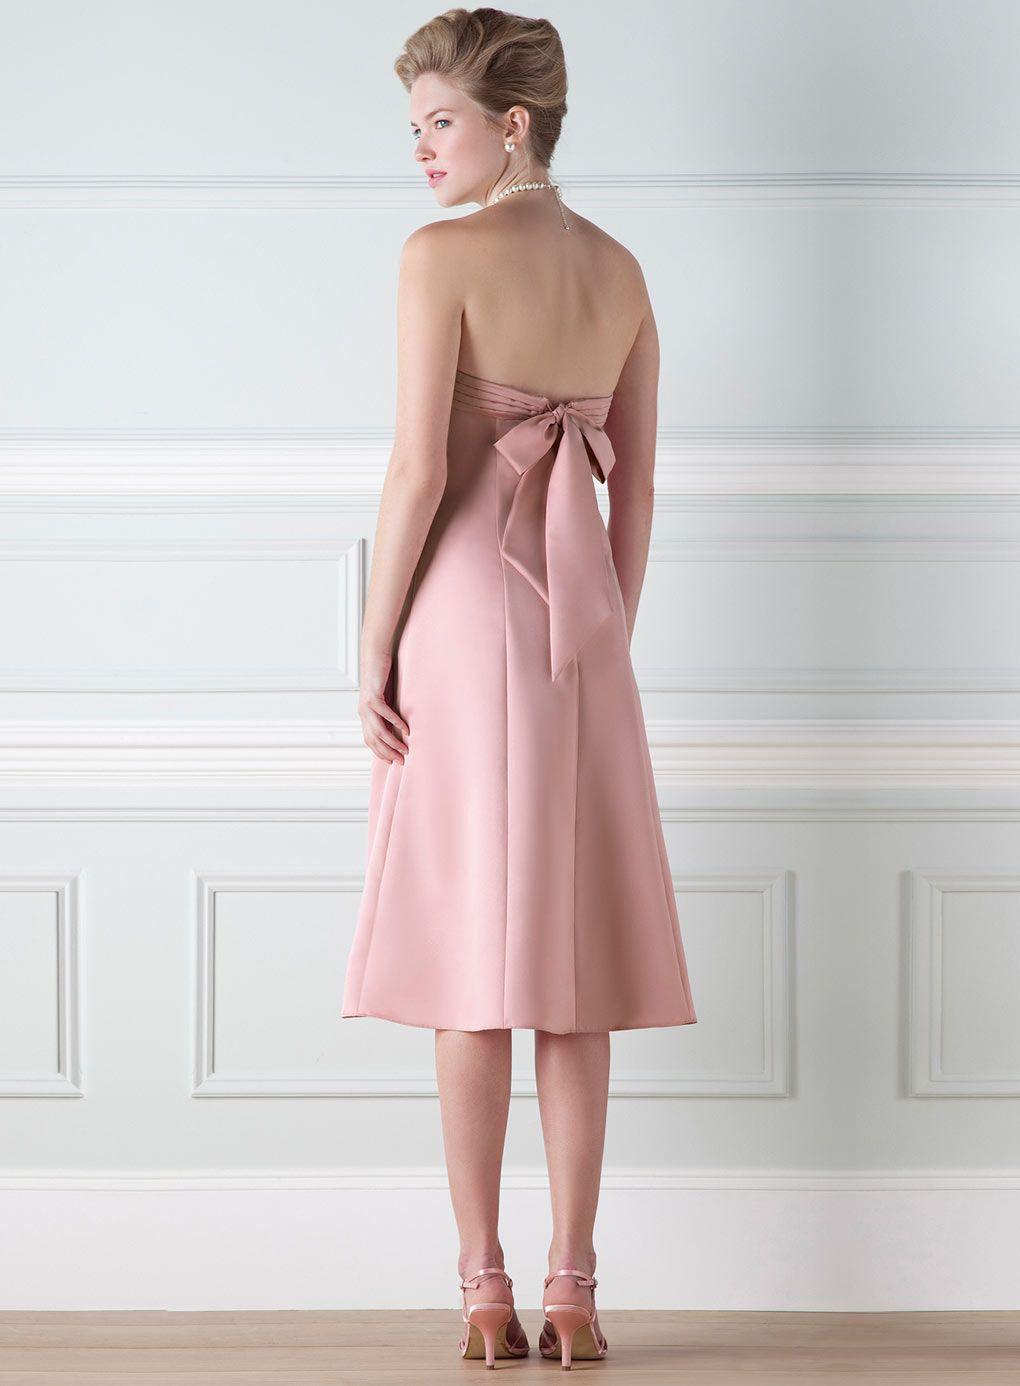 Anna Dusky Pink Satin Bridesmaid Dress - adult bridesmaid - wedding ...